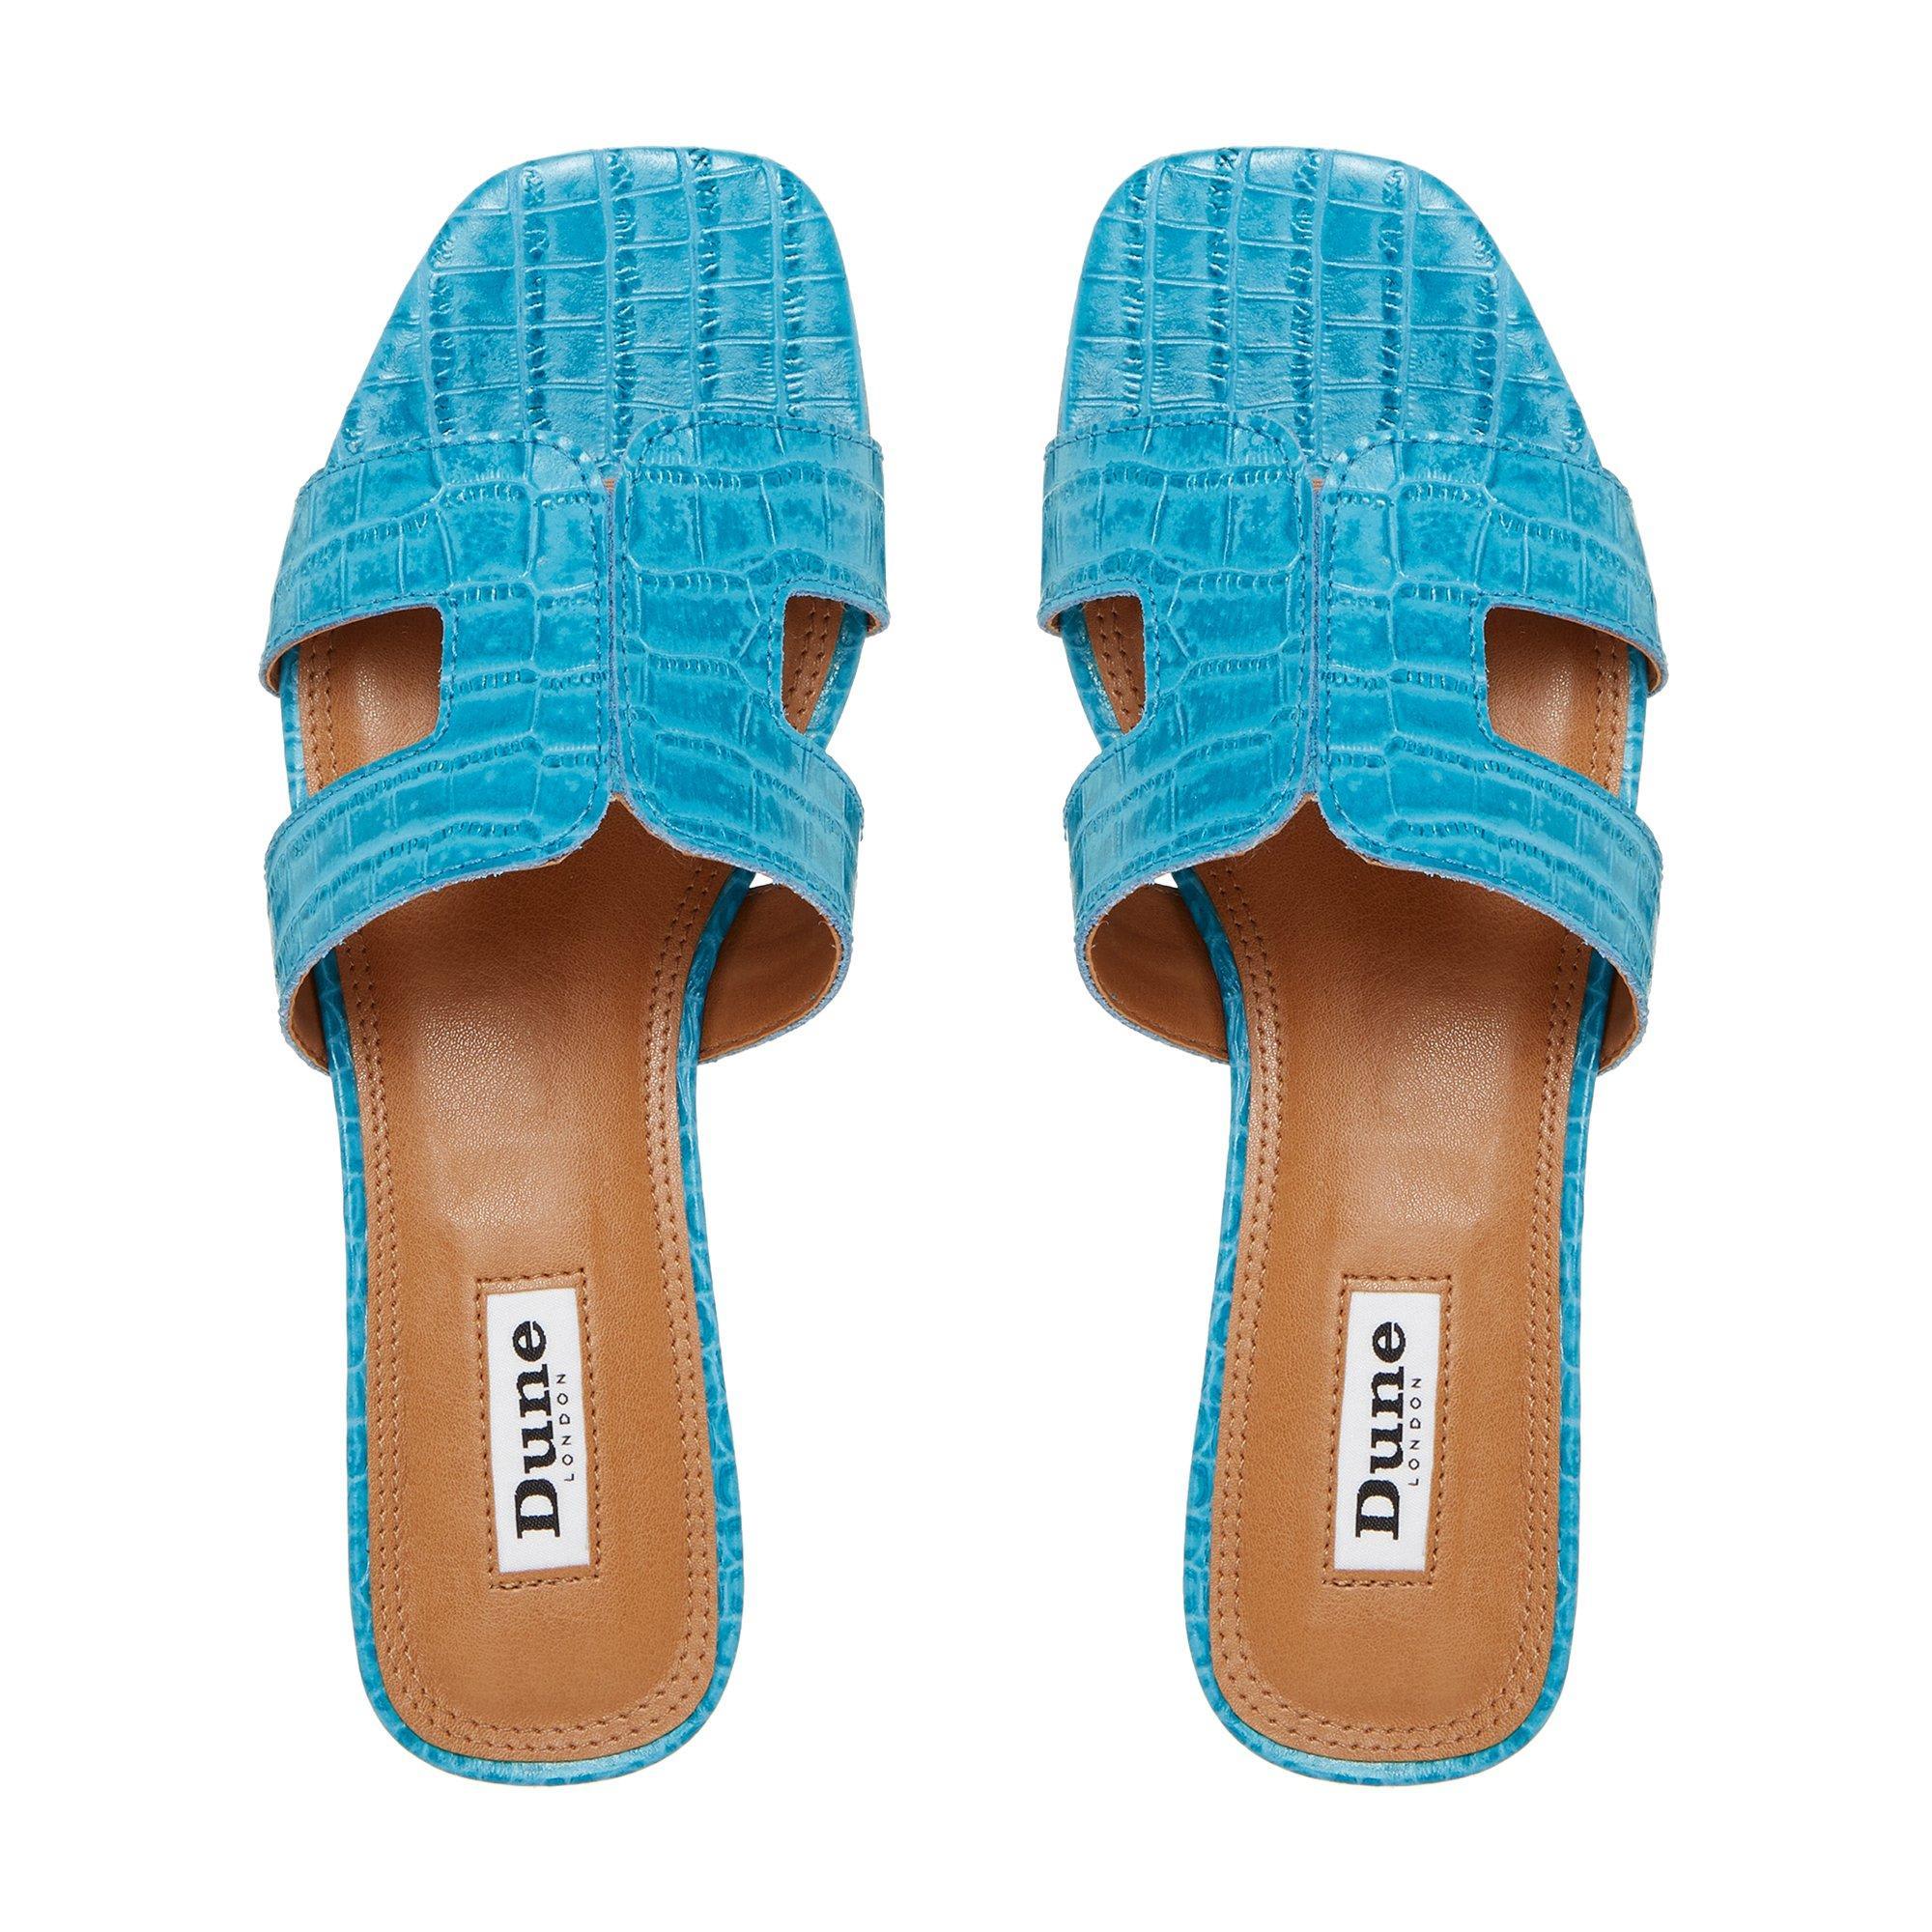 thumbnail 13 - Dune Ladies LOUPE Smart Slider Sandals